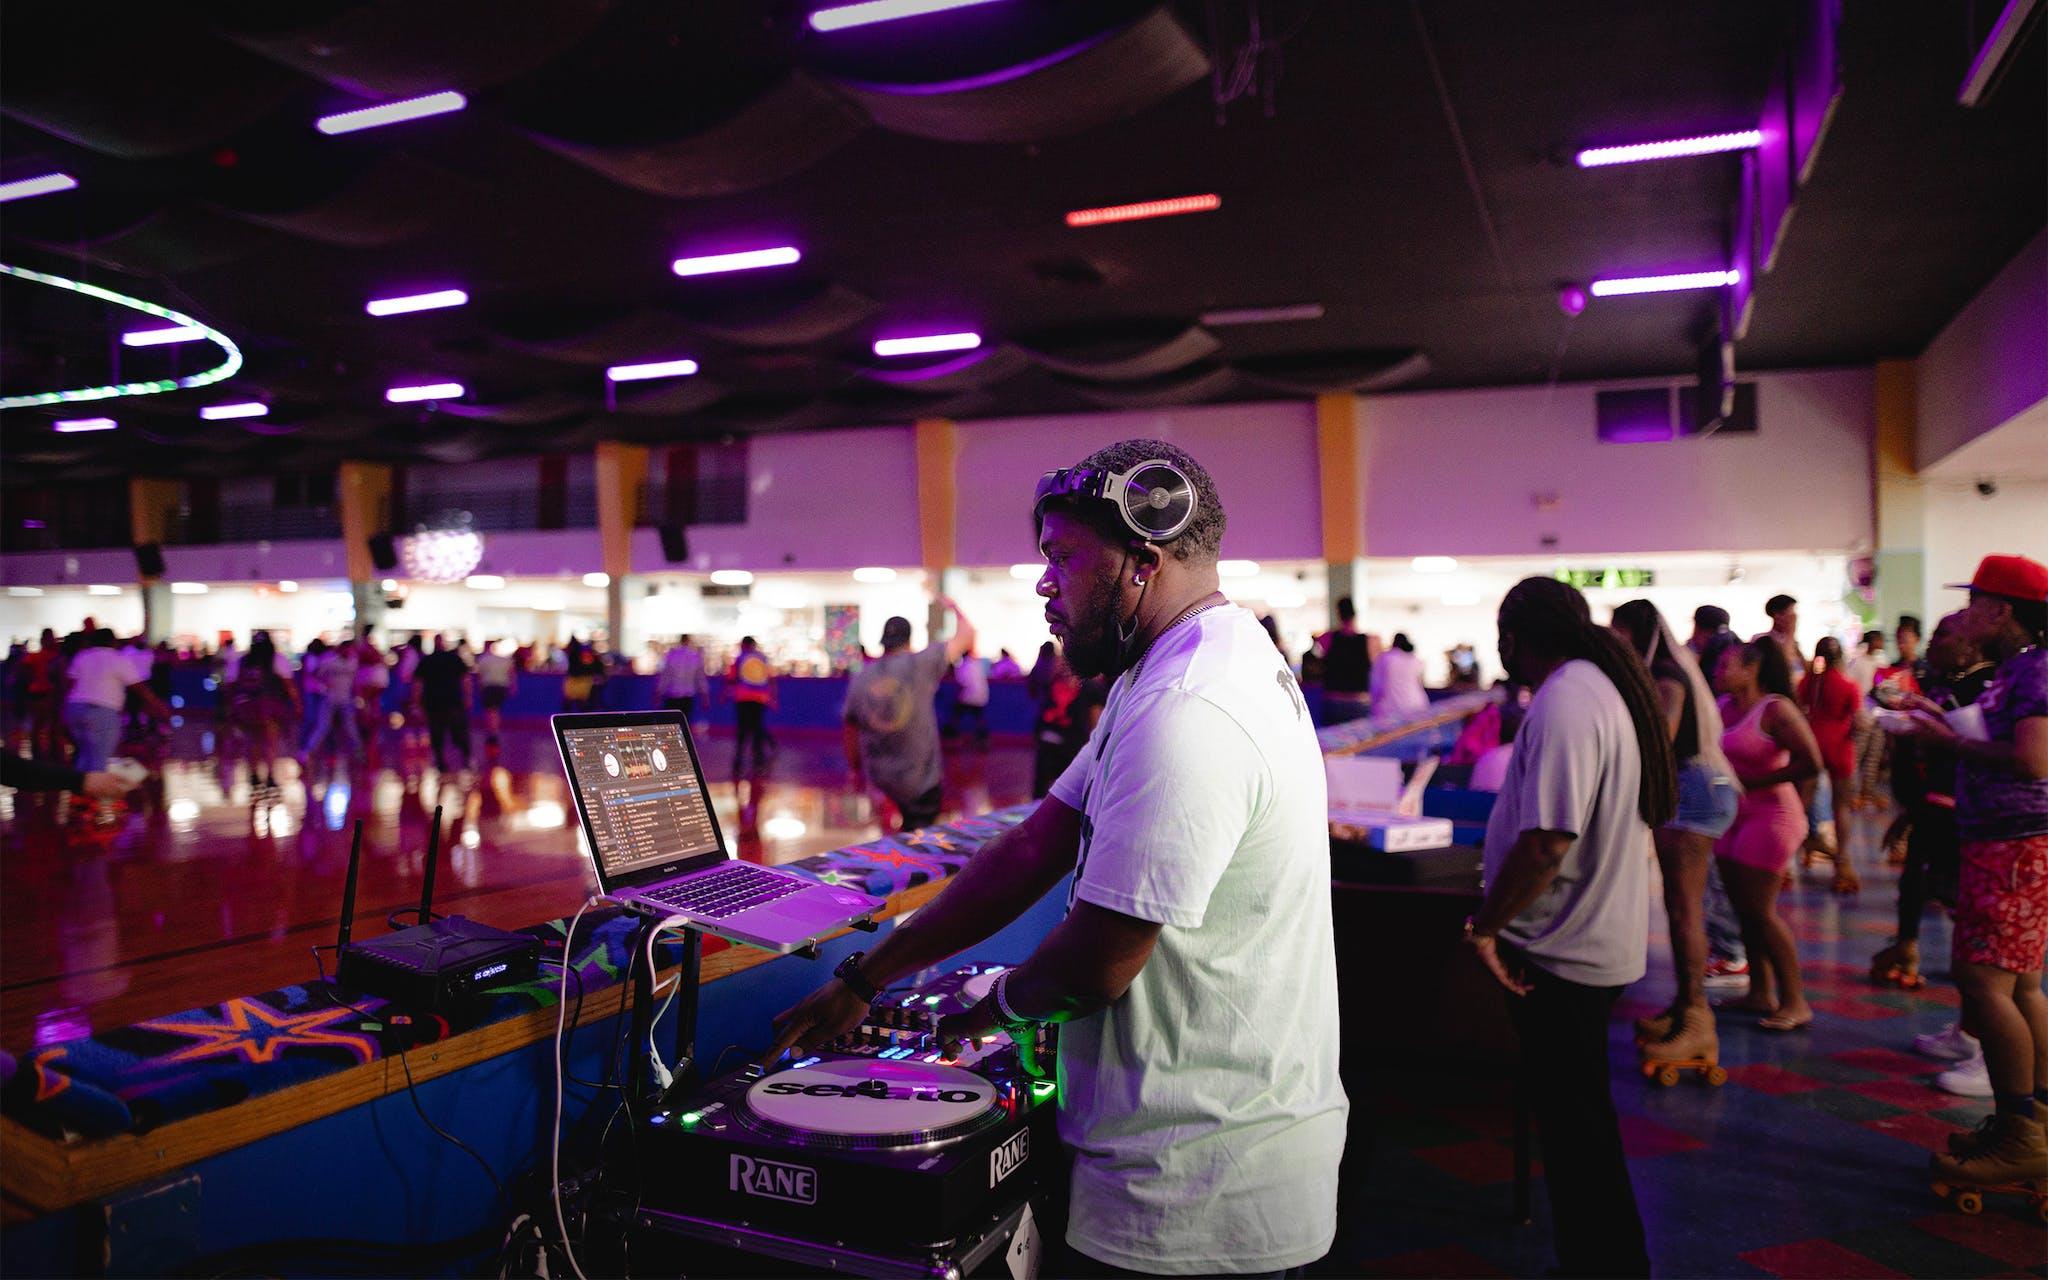 DJ Mike Smoove provides music for the Skate Jam.